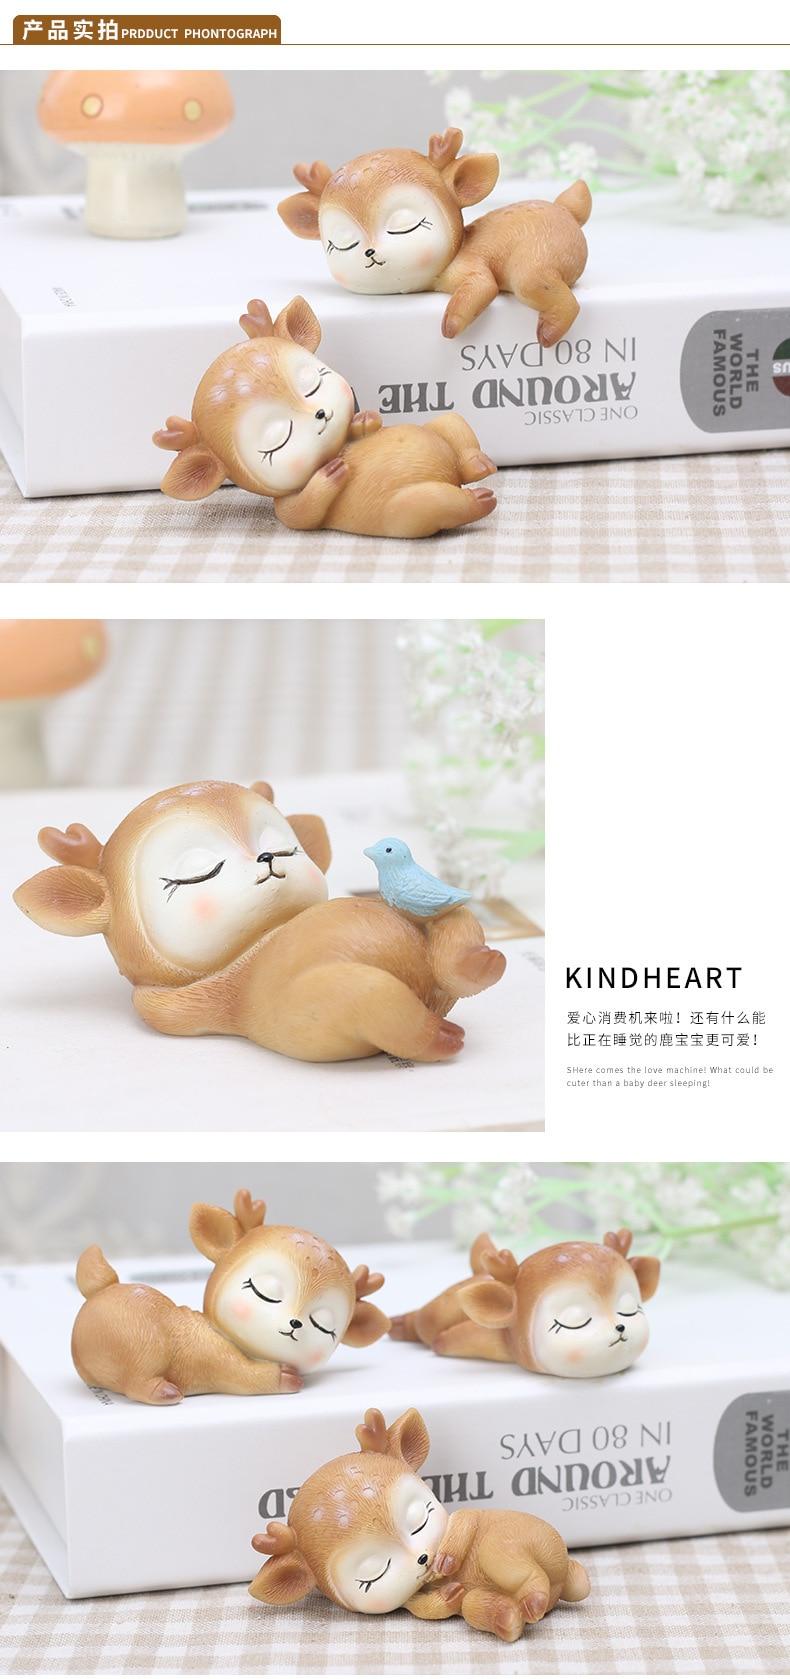 Cute Deer Figurines  Miniature Animal Ornaments Toy Fawn Fun Decor